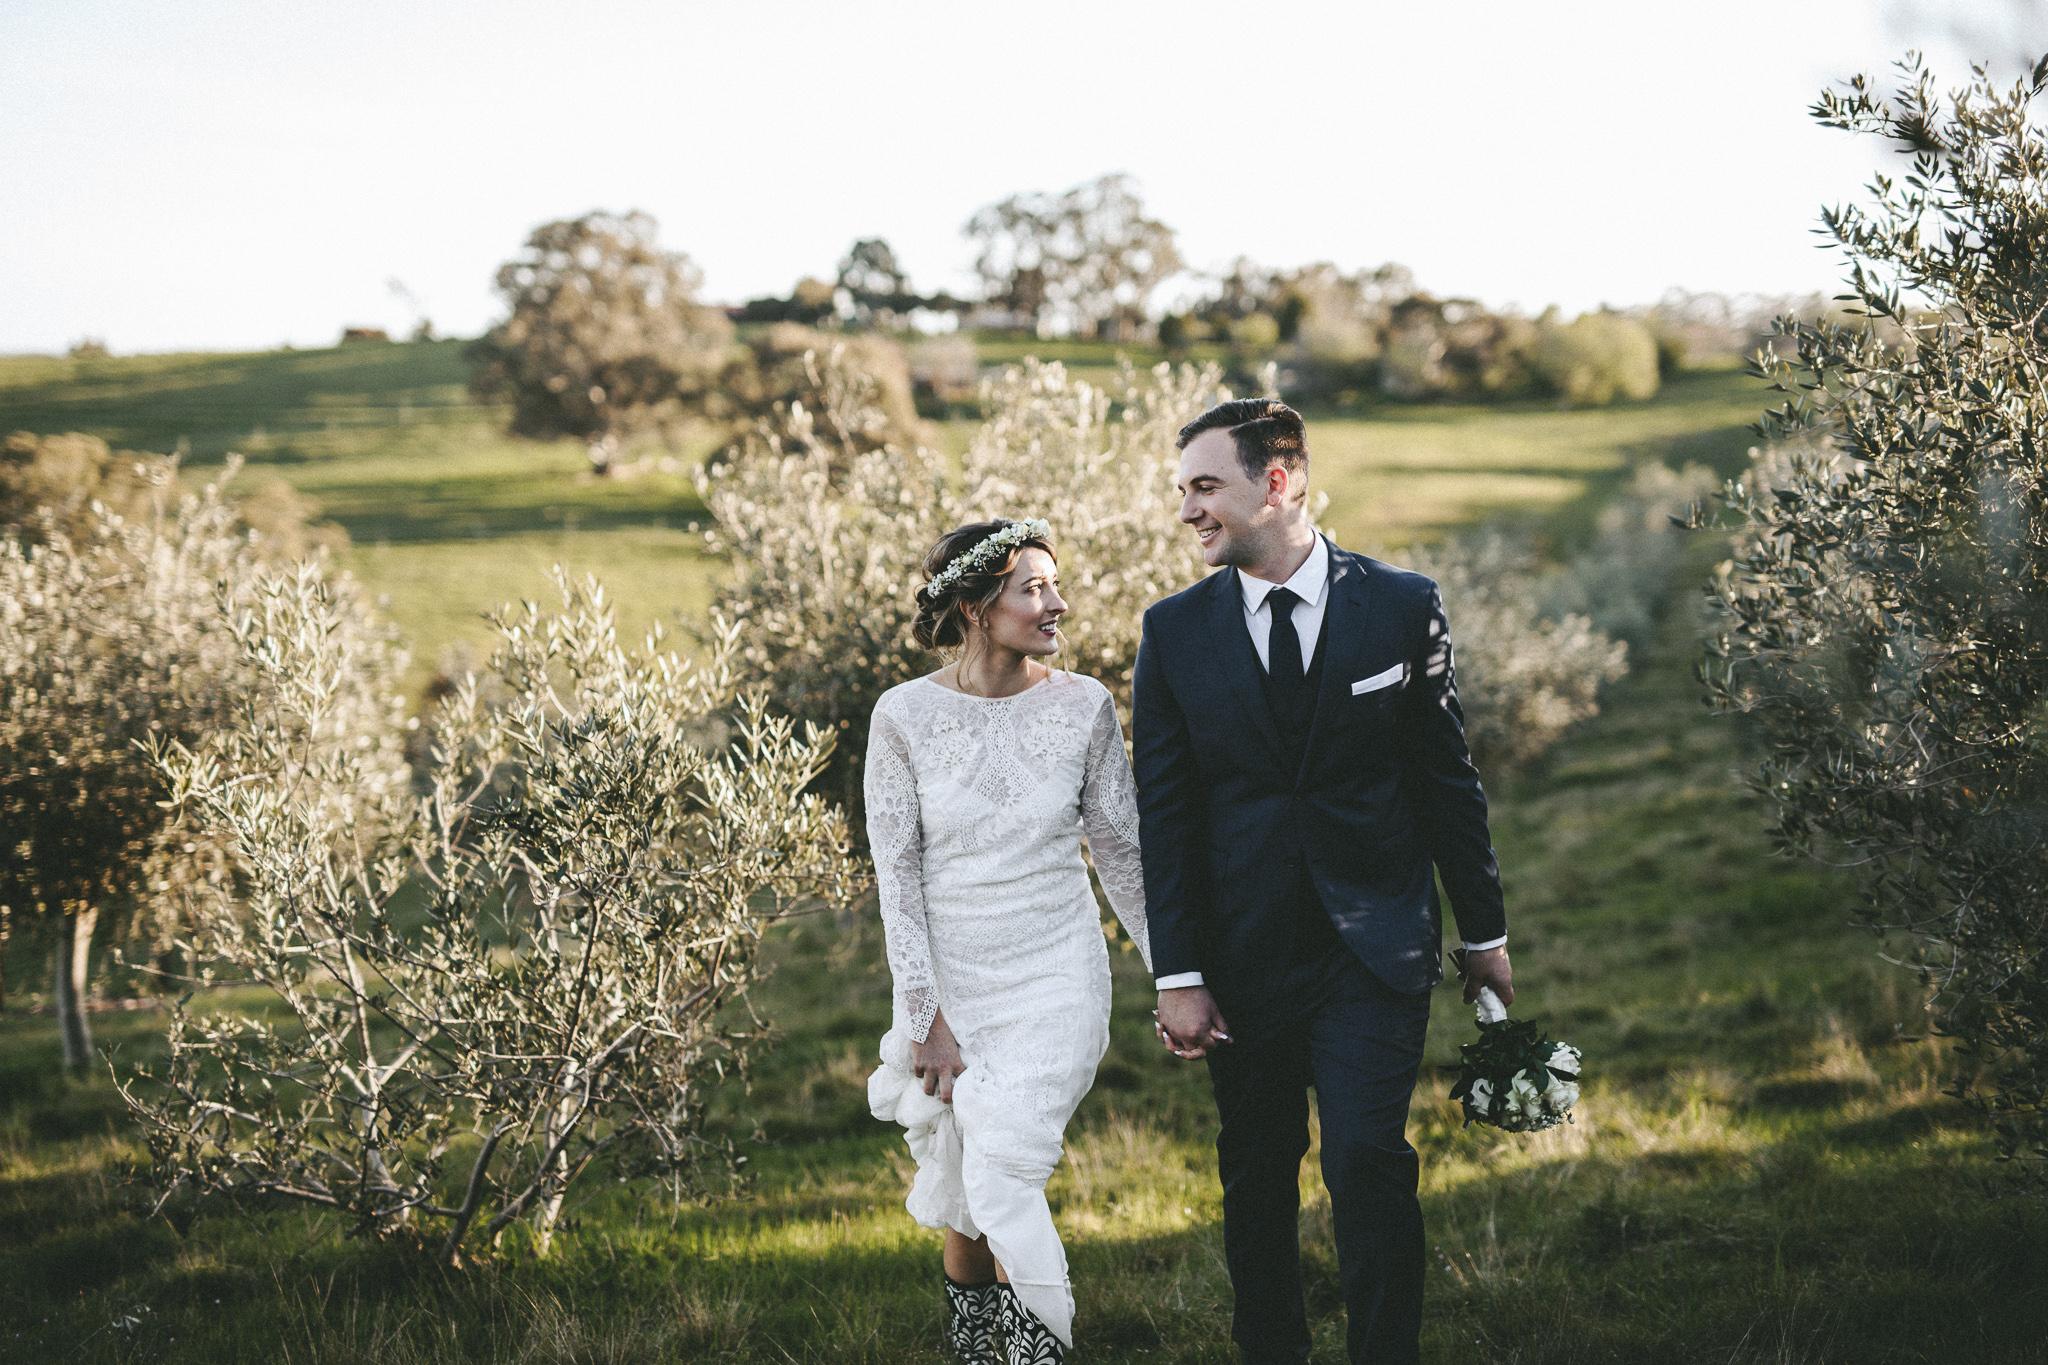 christopher morrison_adelaide hills wedding_ andy + teegan_74_0963.jpg